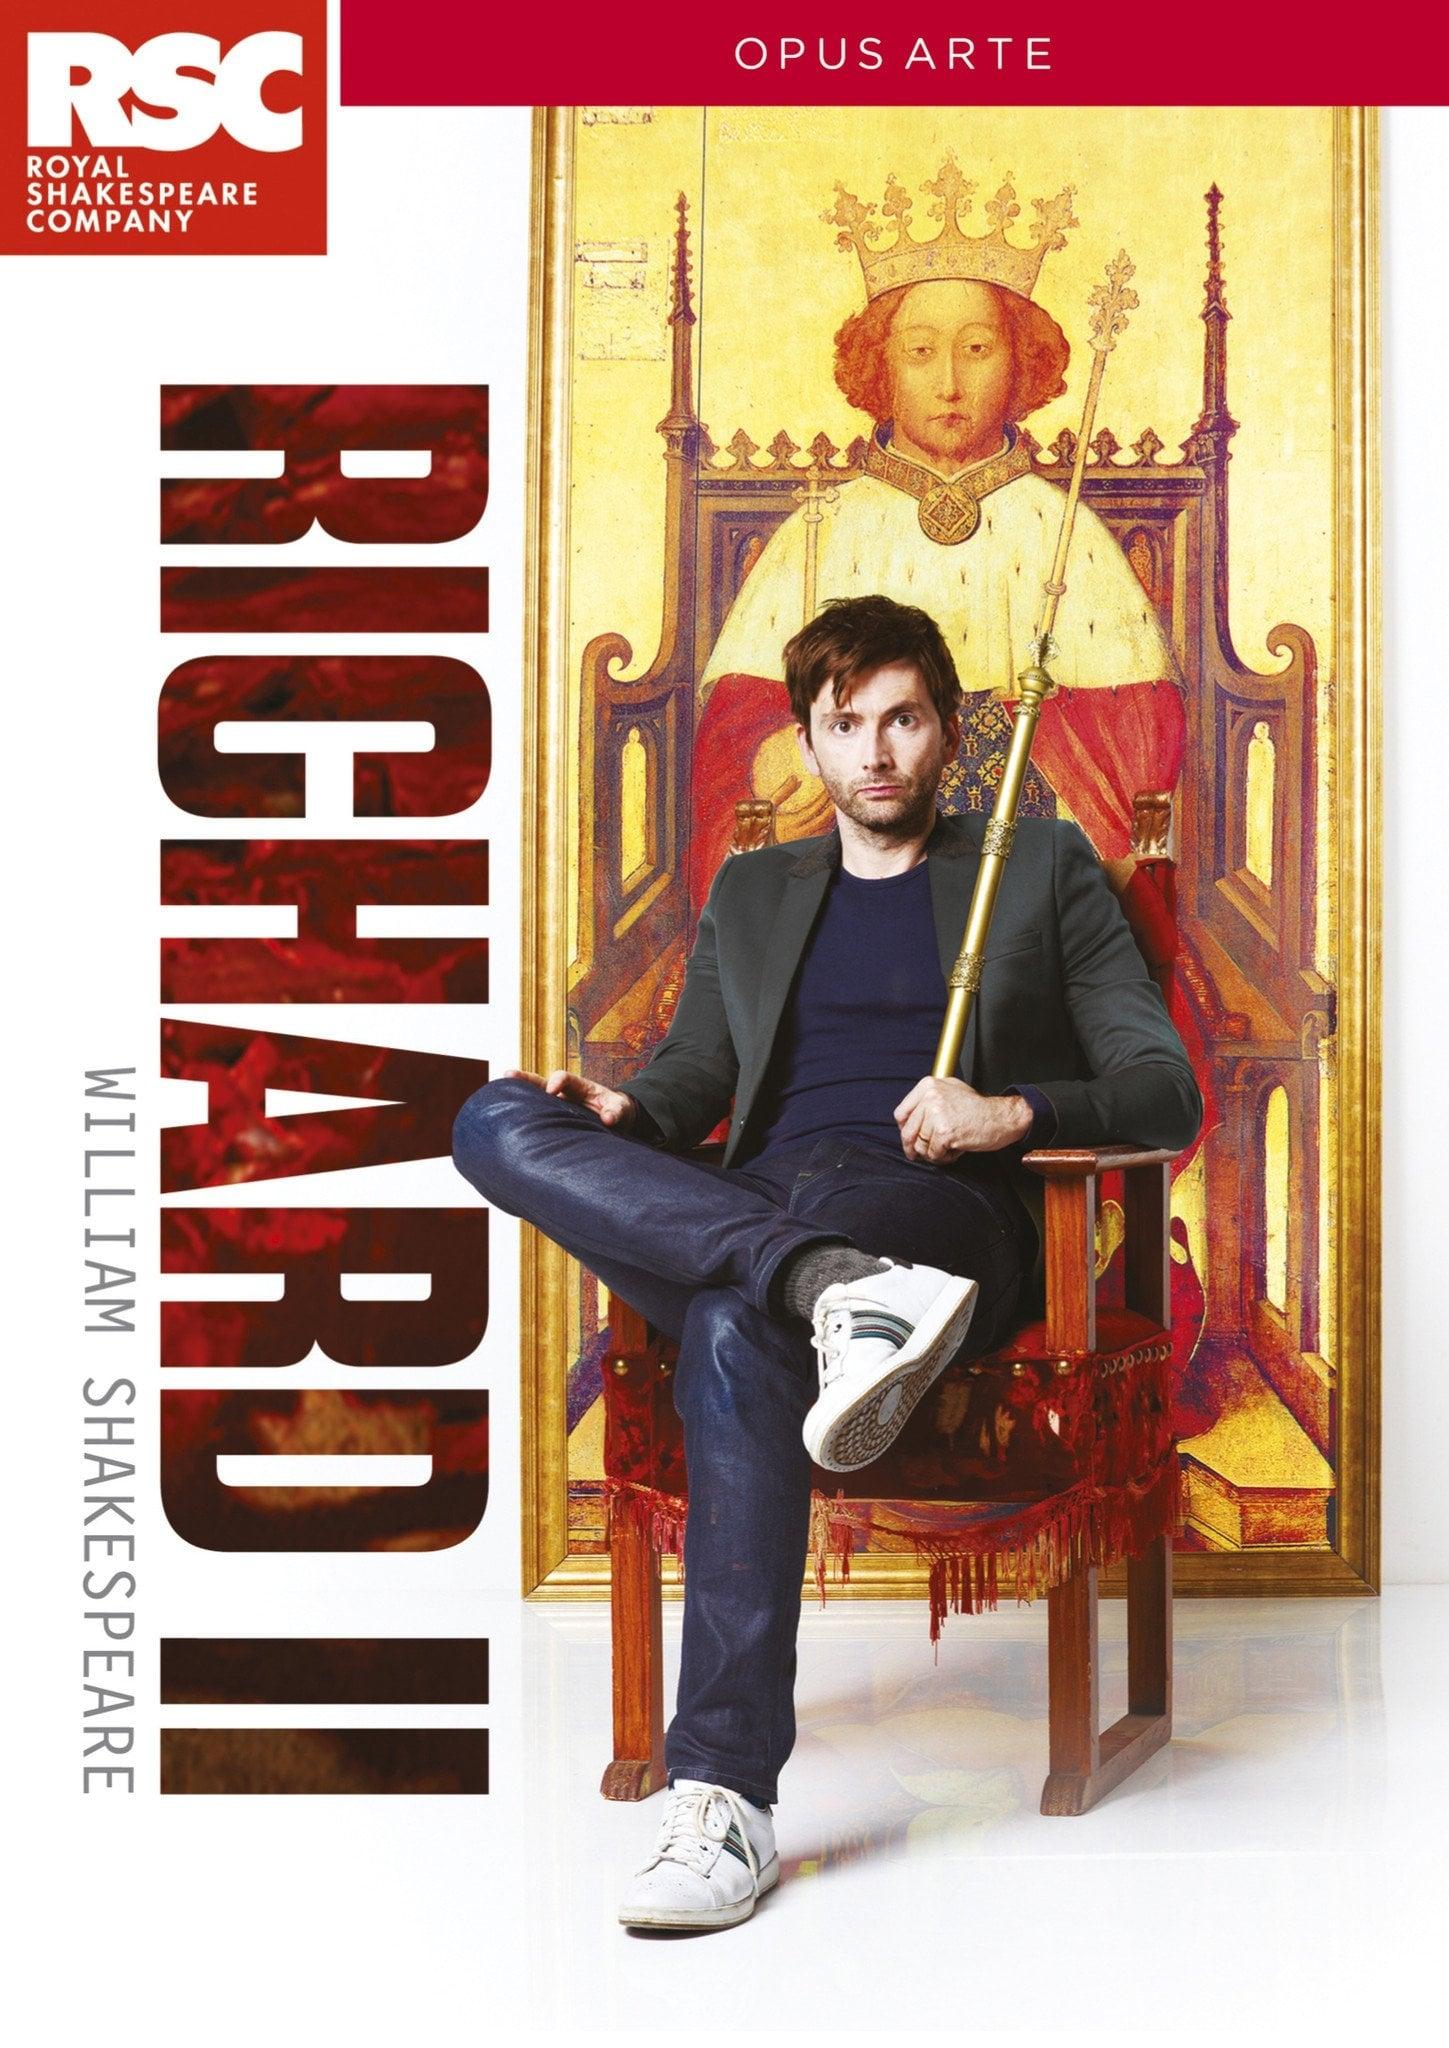 Royal Shakespeare Company - Richard II (2013)